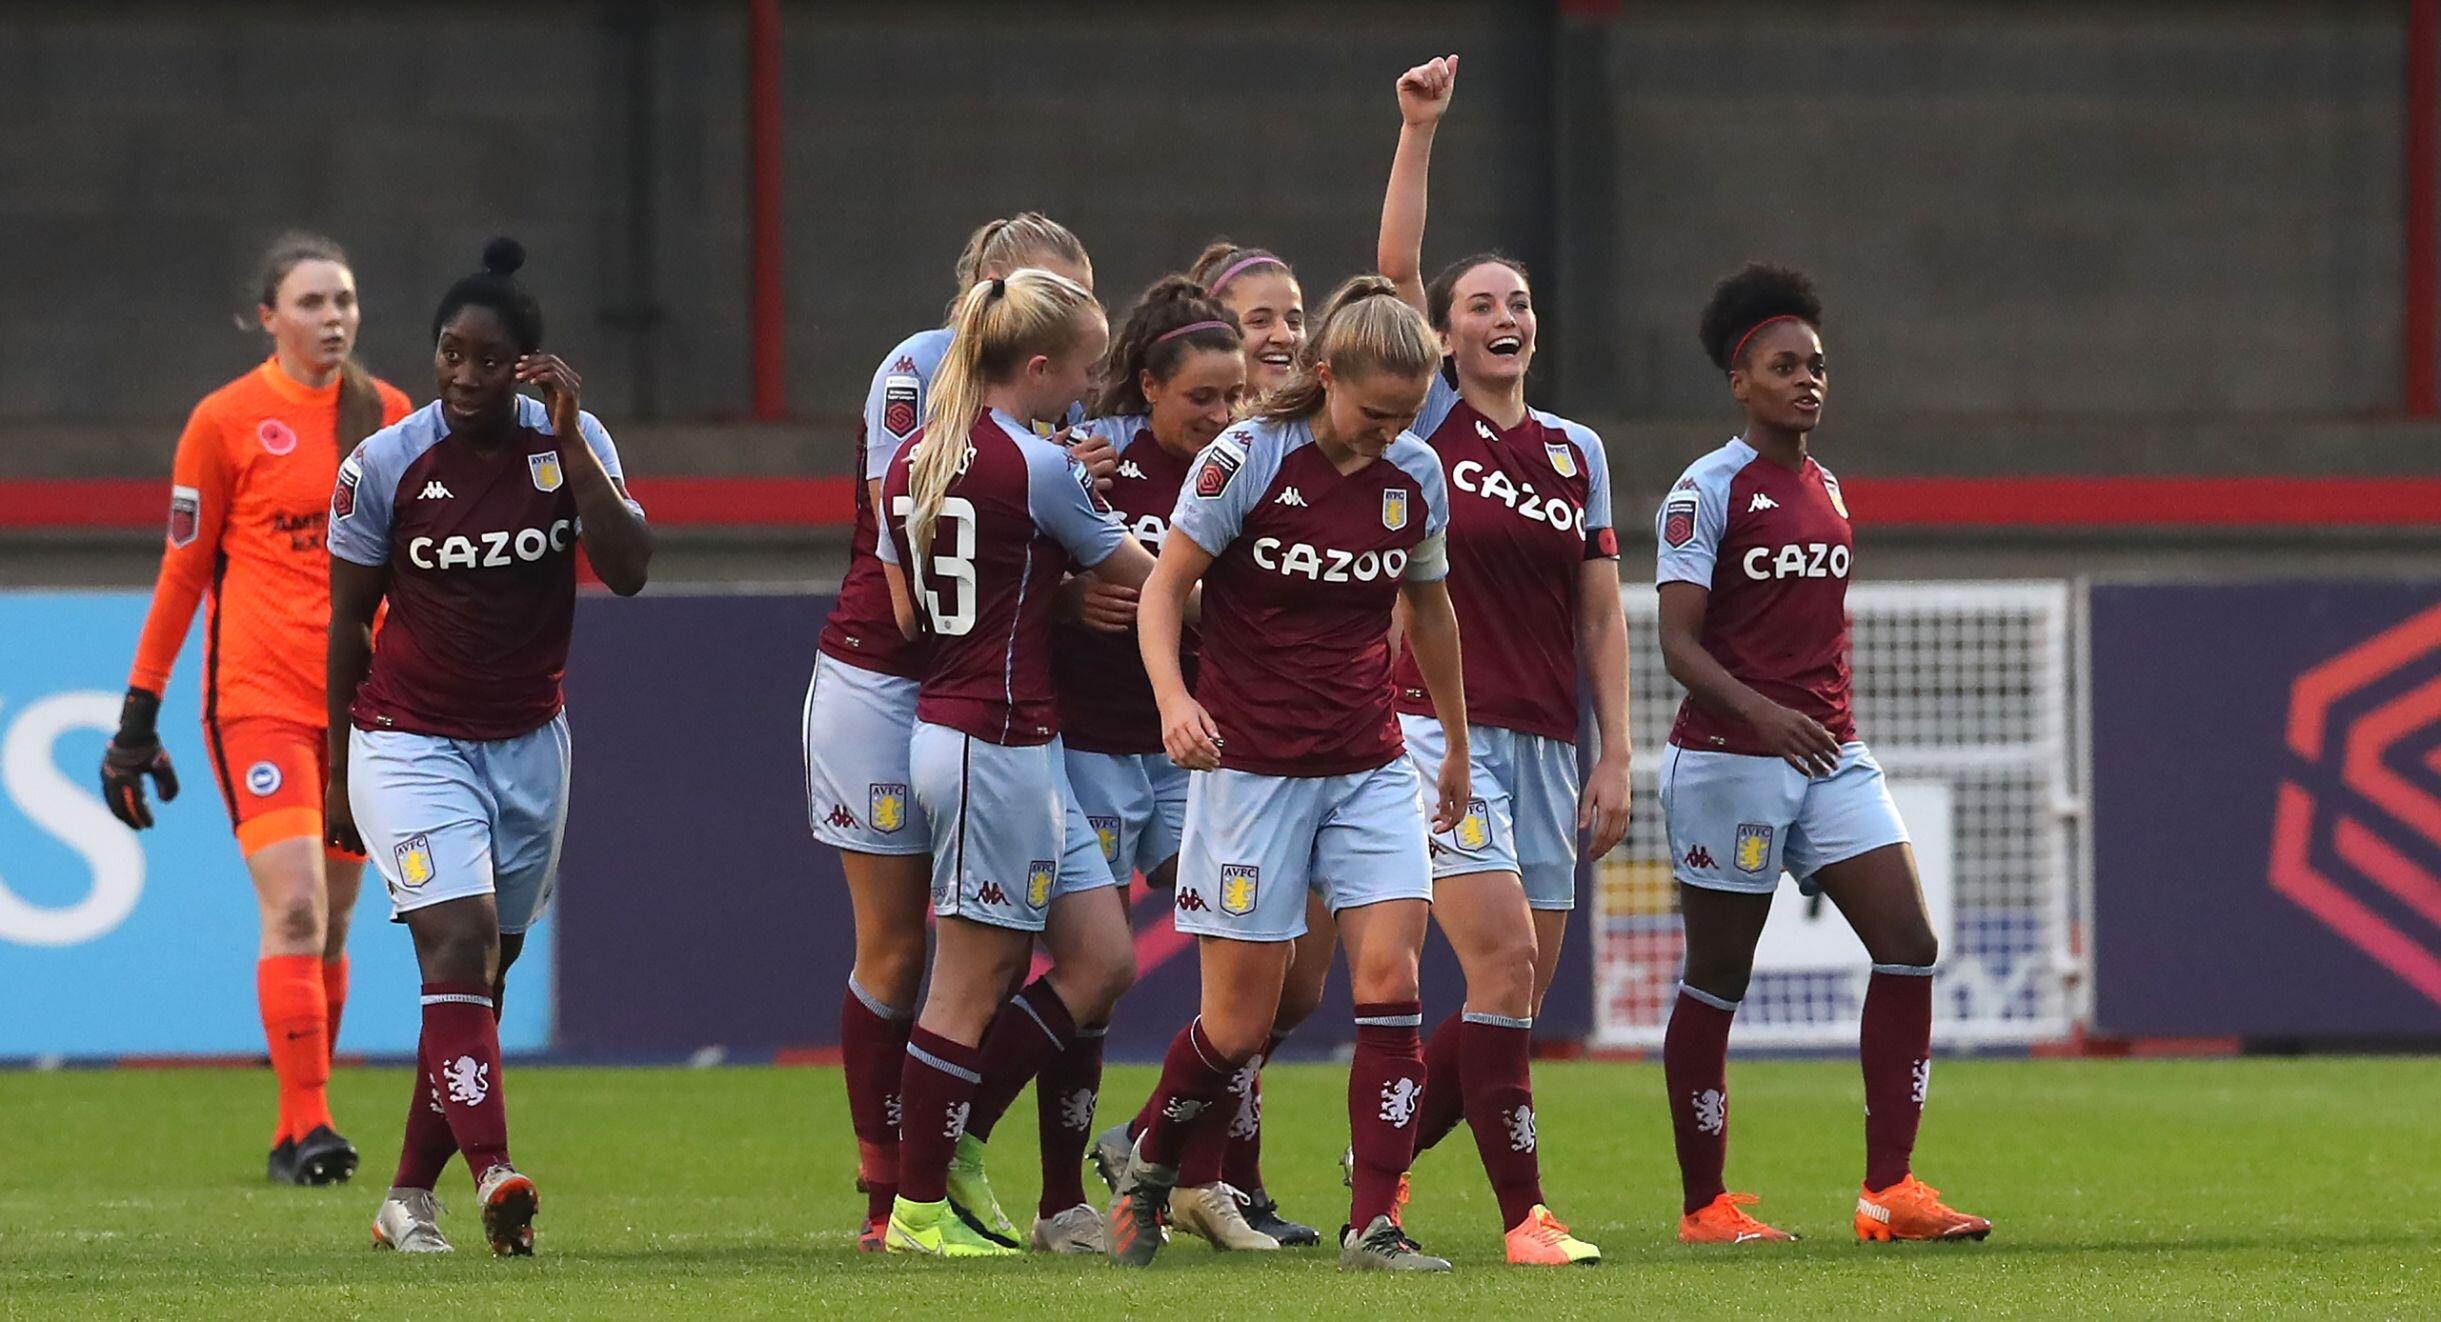 Aston Villa has kept itself out of relegation danger—so far